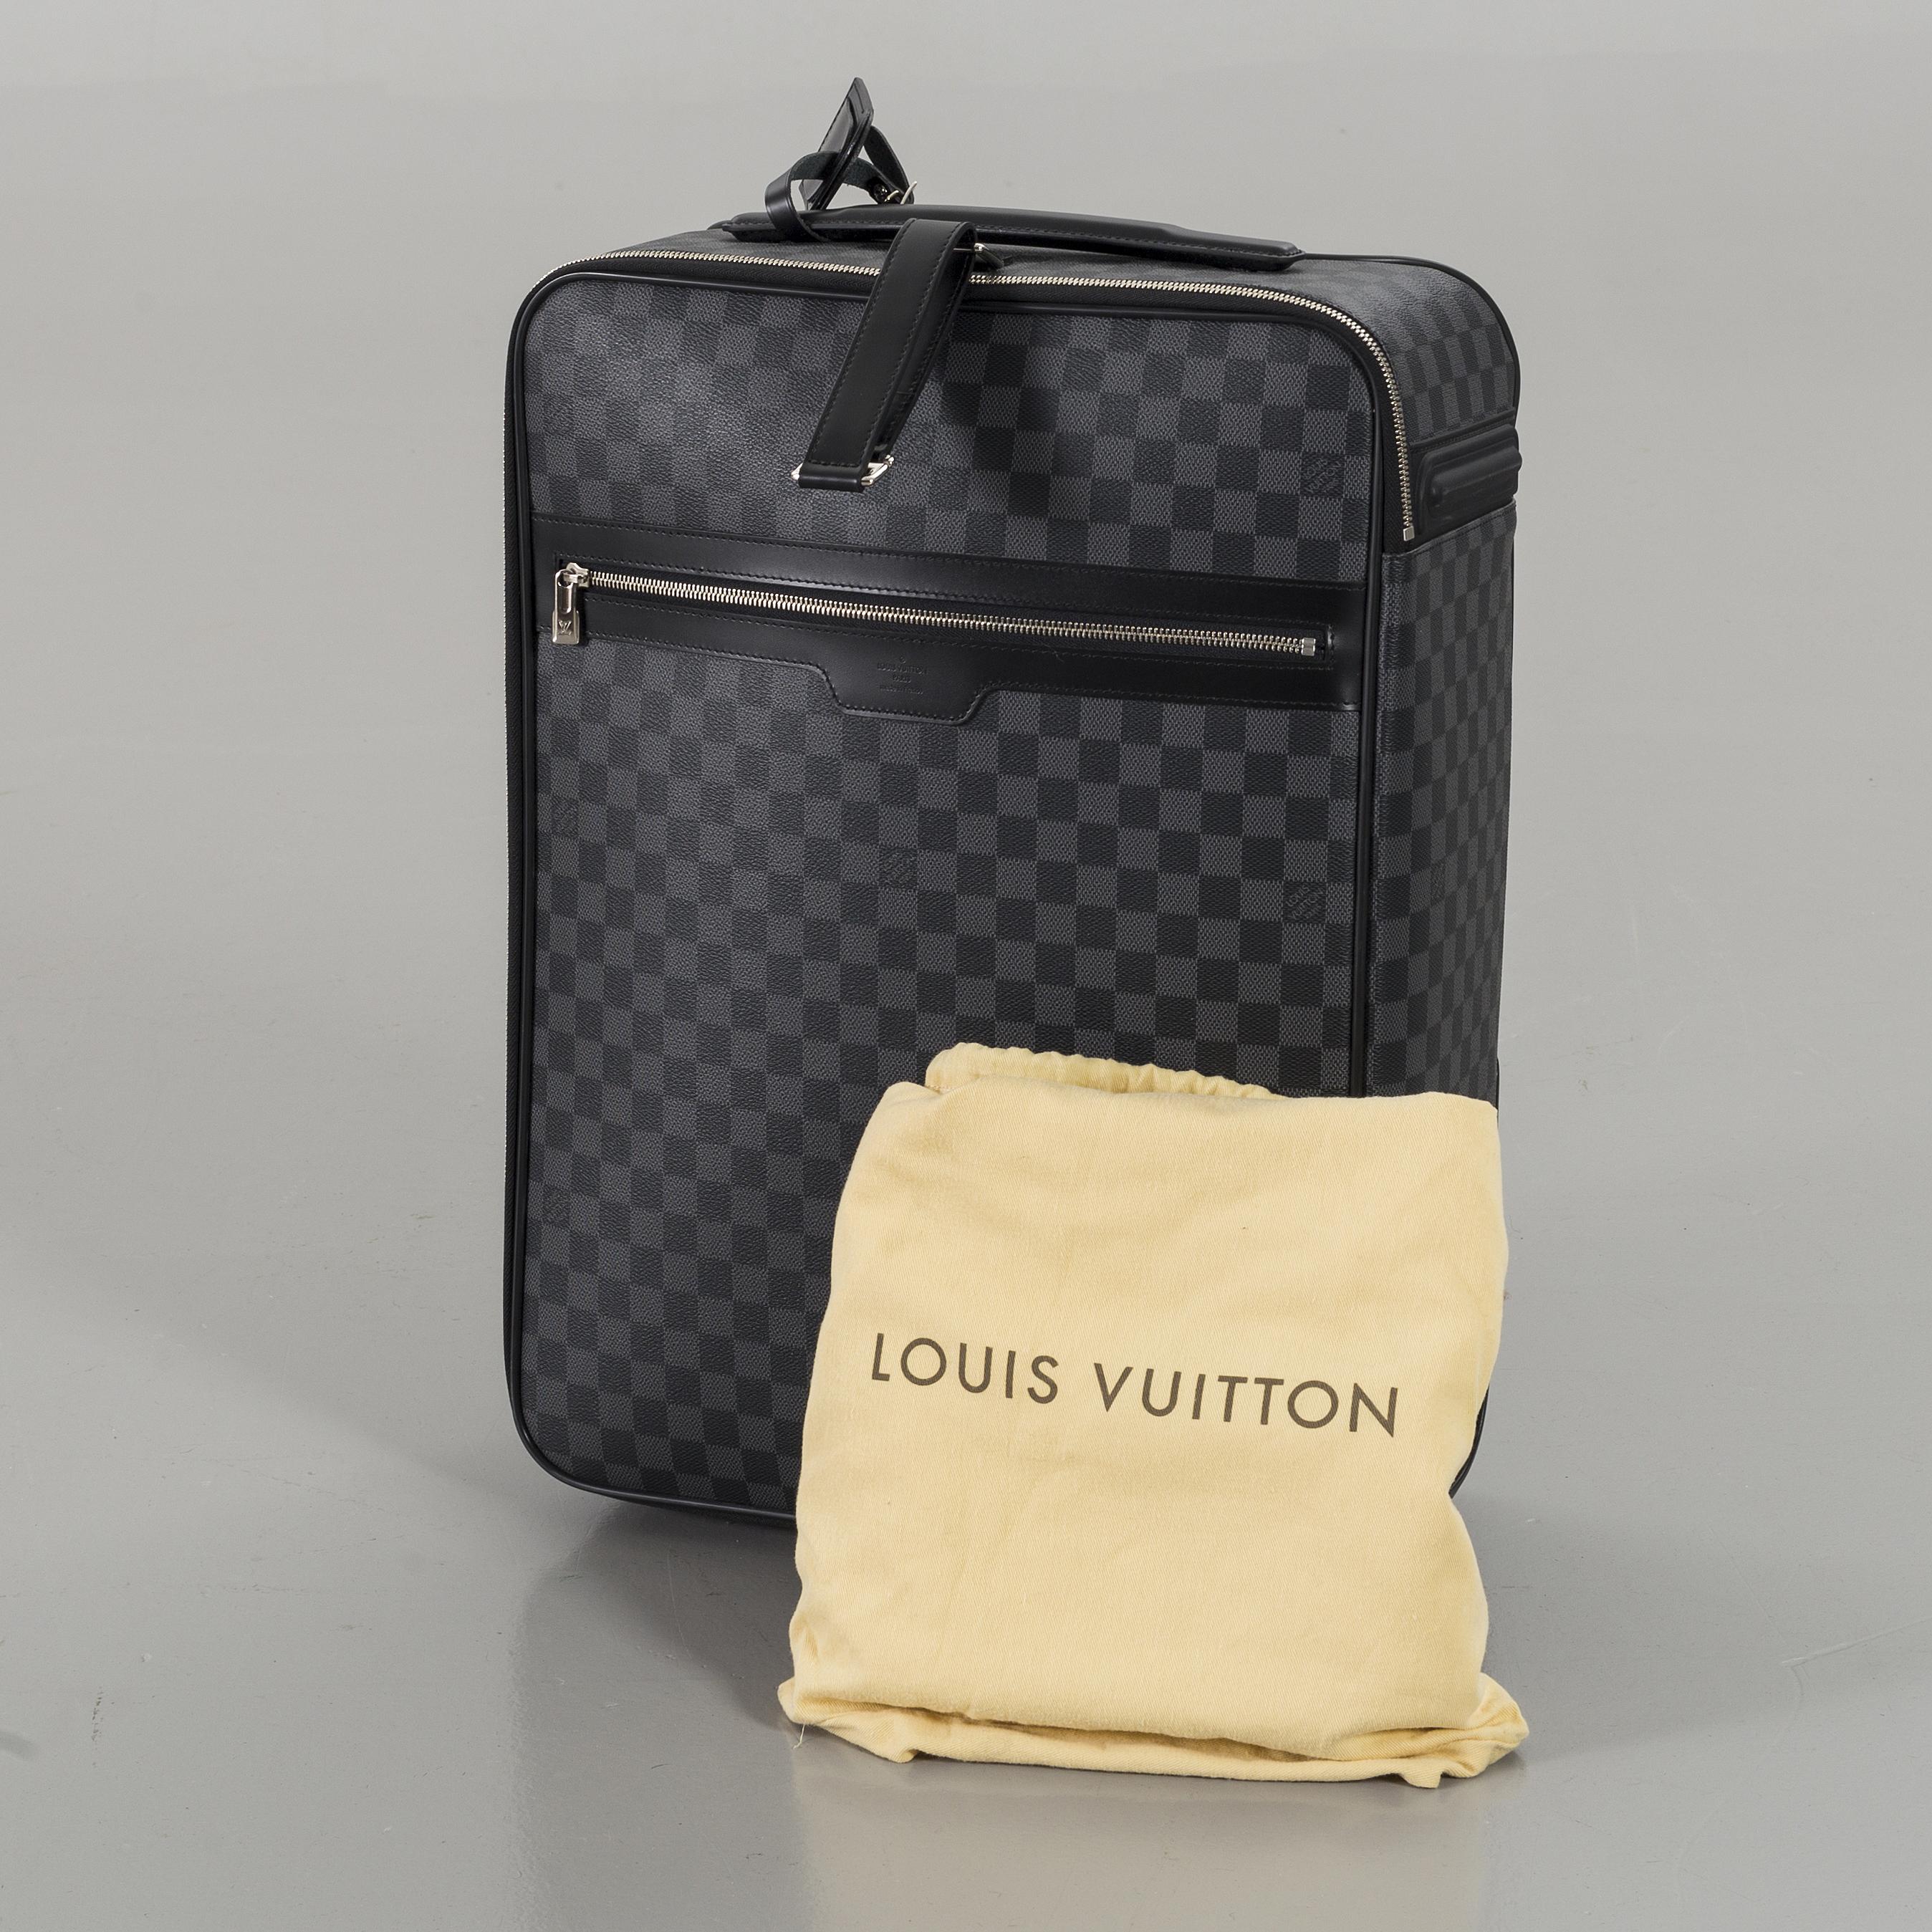 998eaafa9 A LOUIS VUITTON TRAVEL BAG,